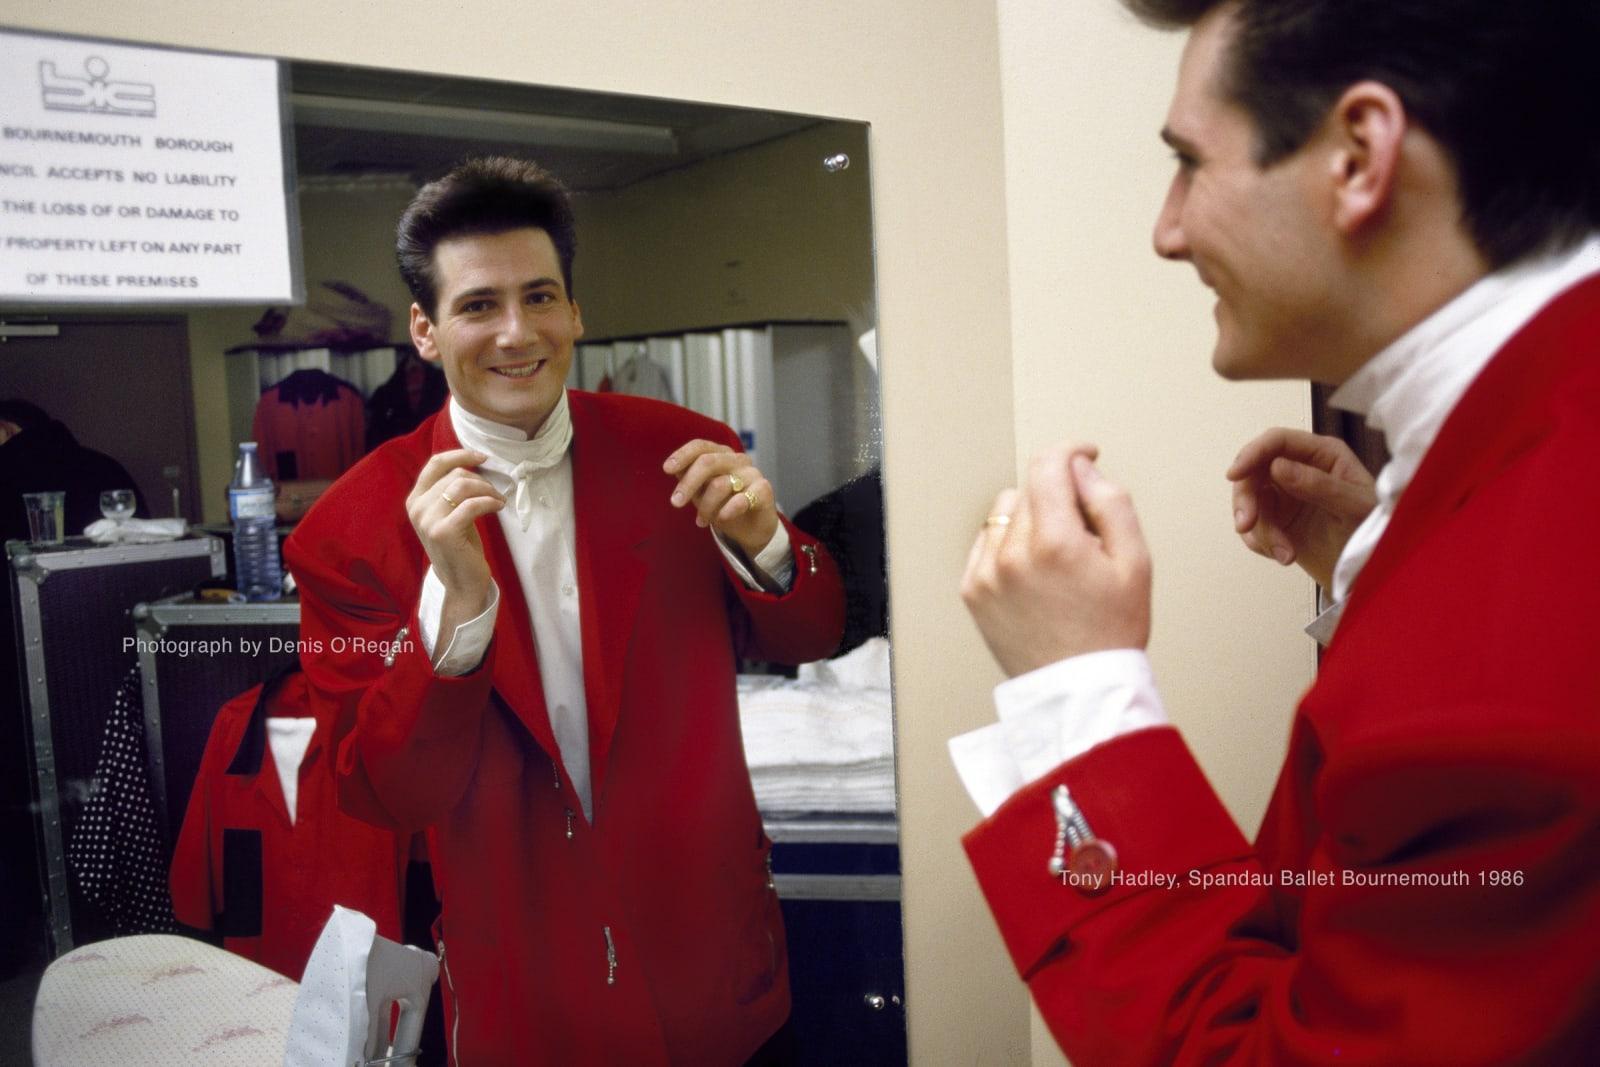 SPANDAU BALLET, Tony Hadley backstage Bournemouth, 1986